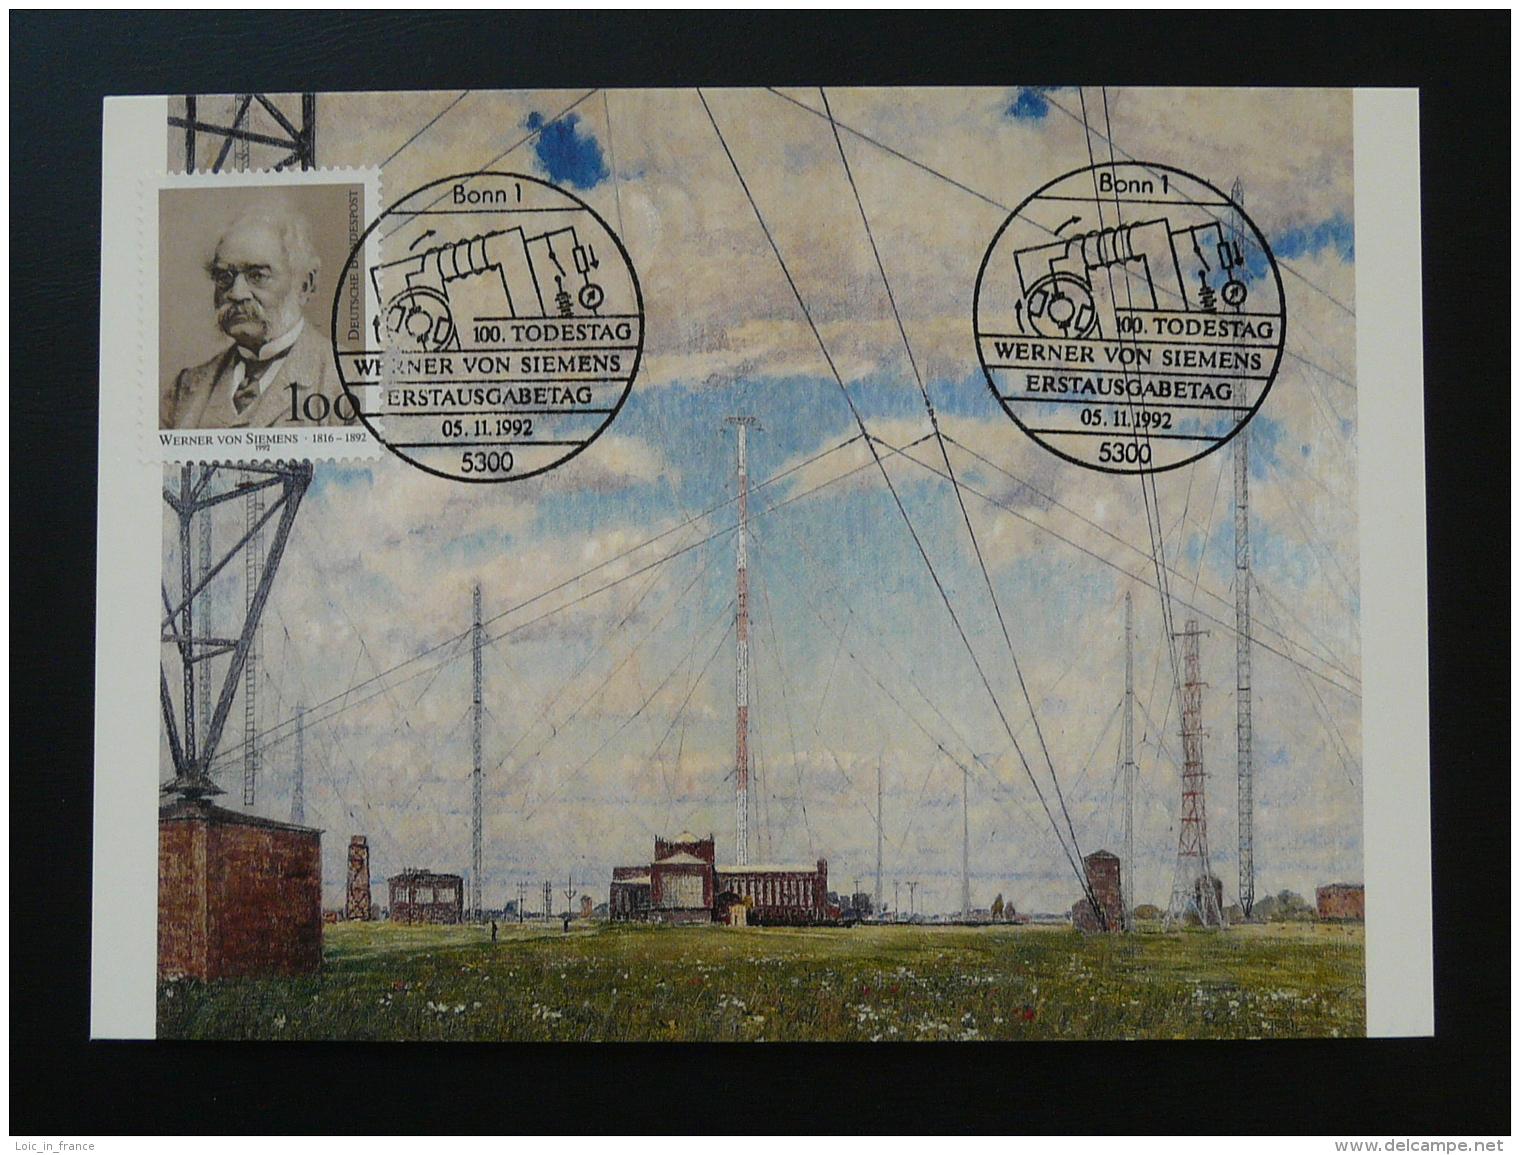 090-11 Telecommunications Werner Von Siemens Postmuseum Karte Carte Maximum Card Bonn 1992 - Telecom